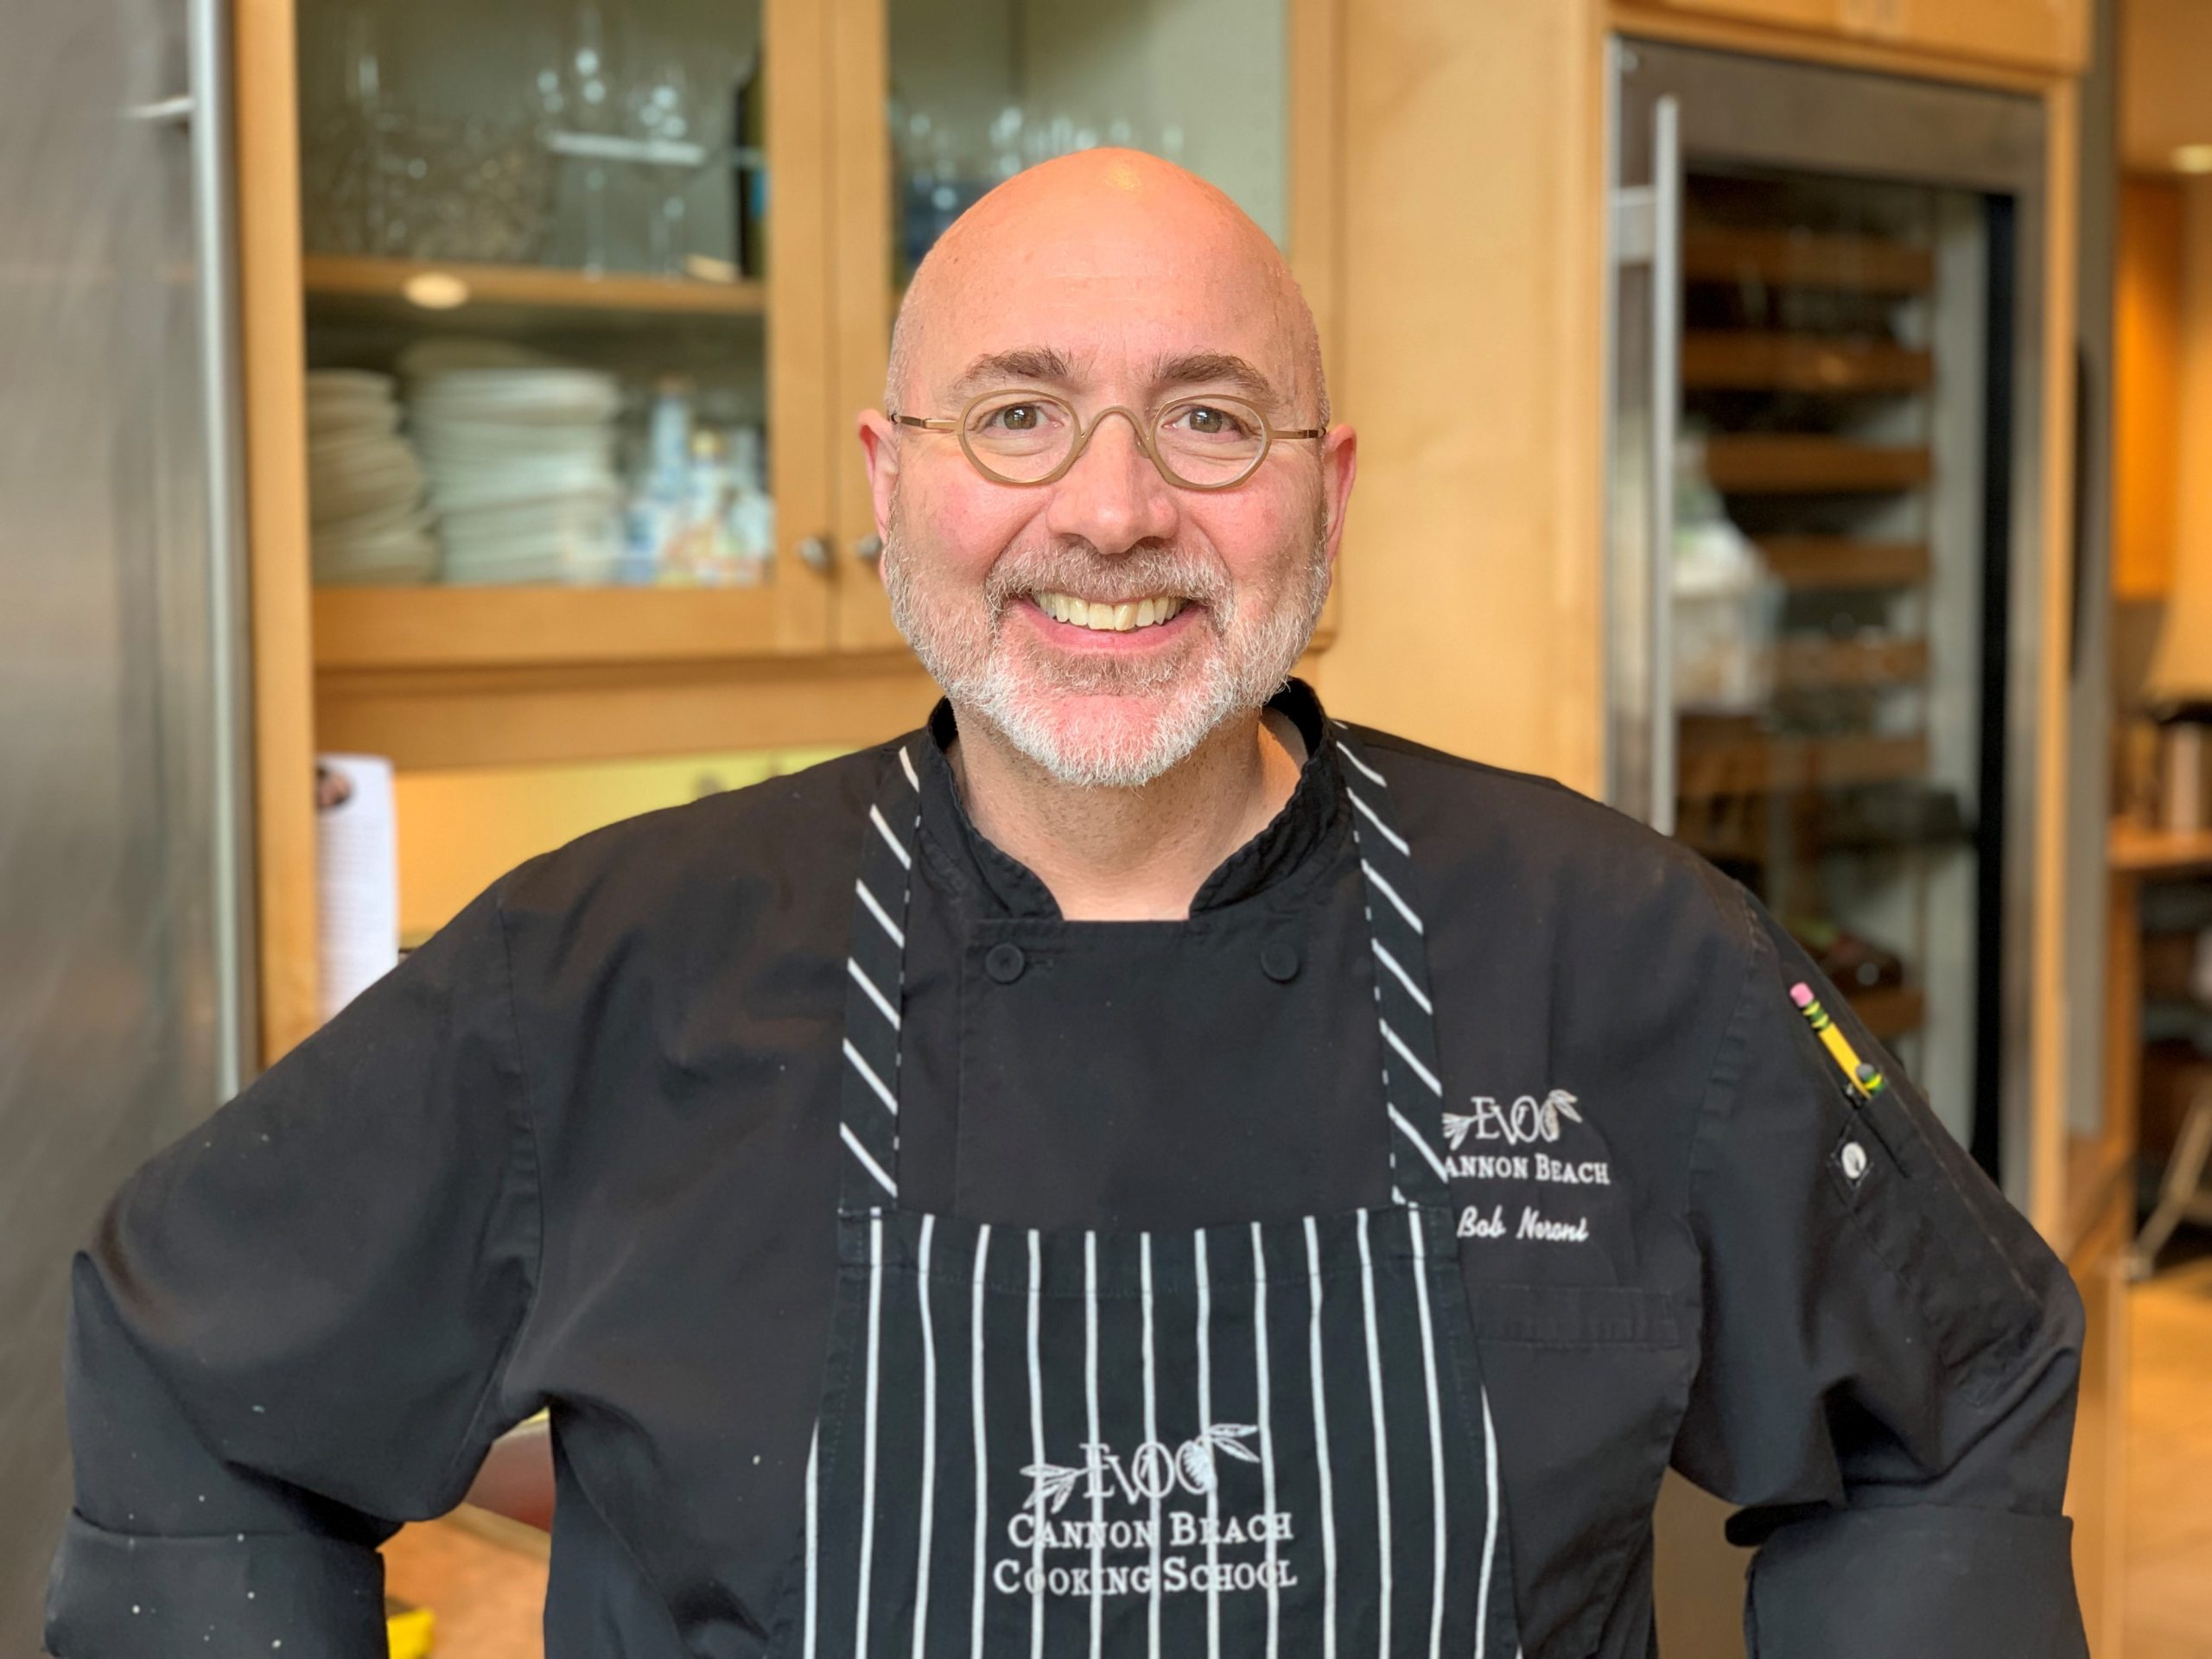 Chef Bob Neroni